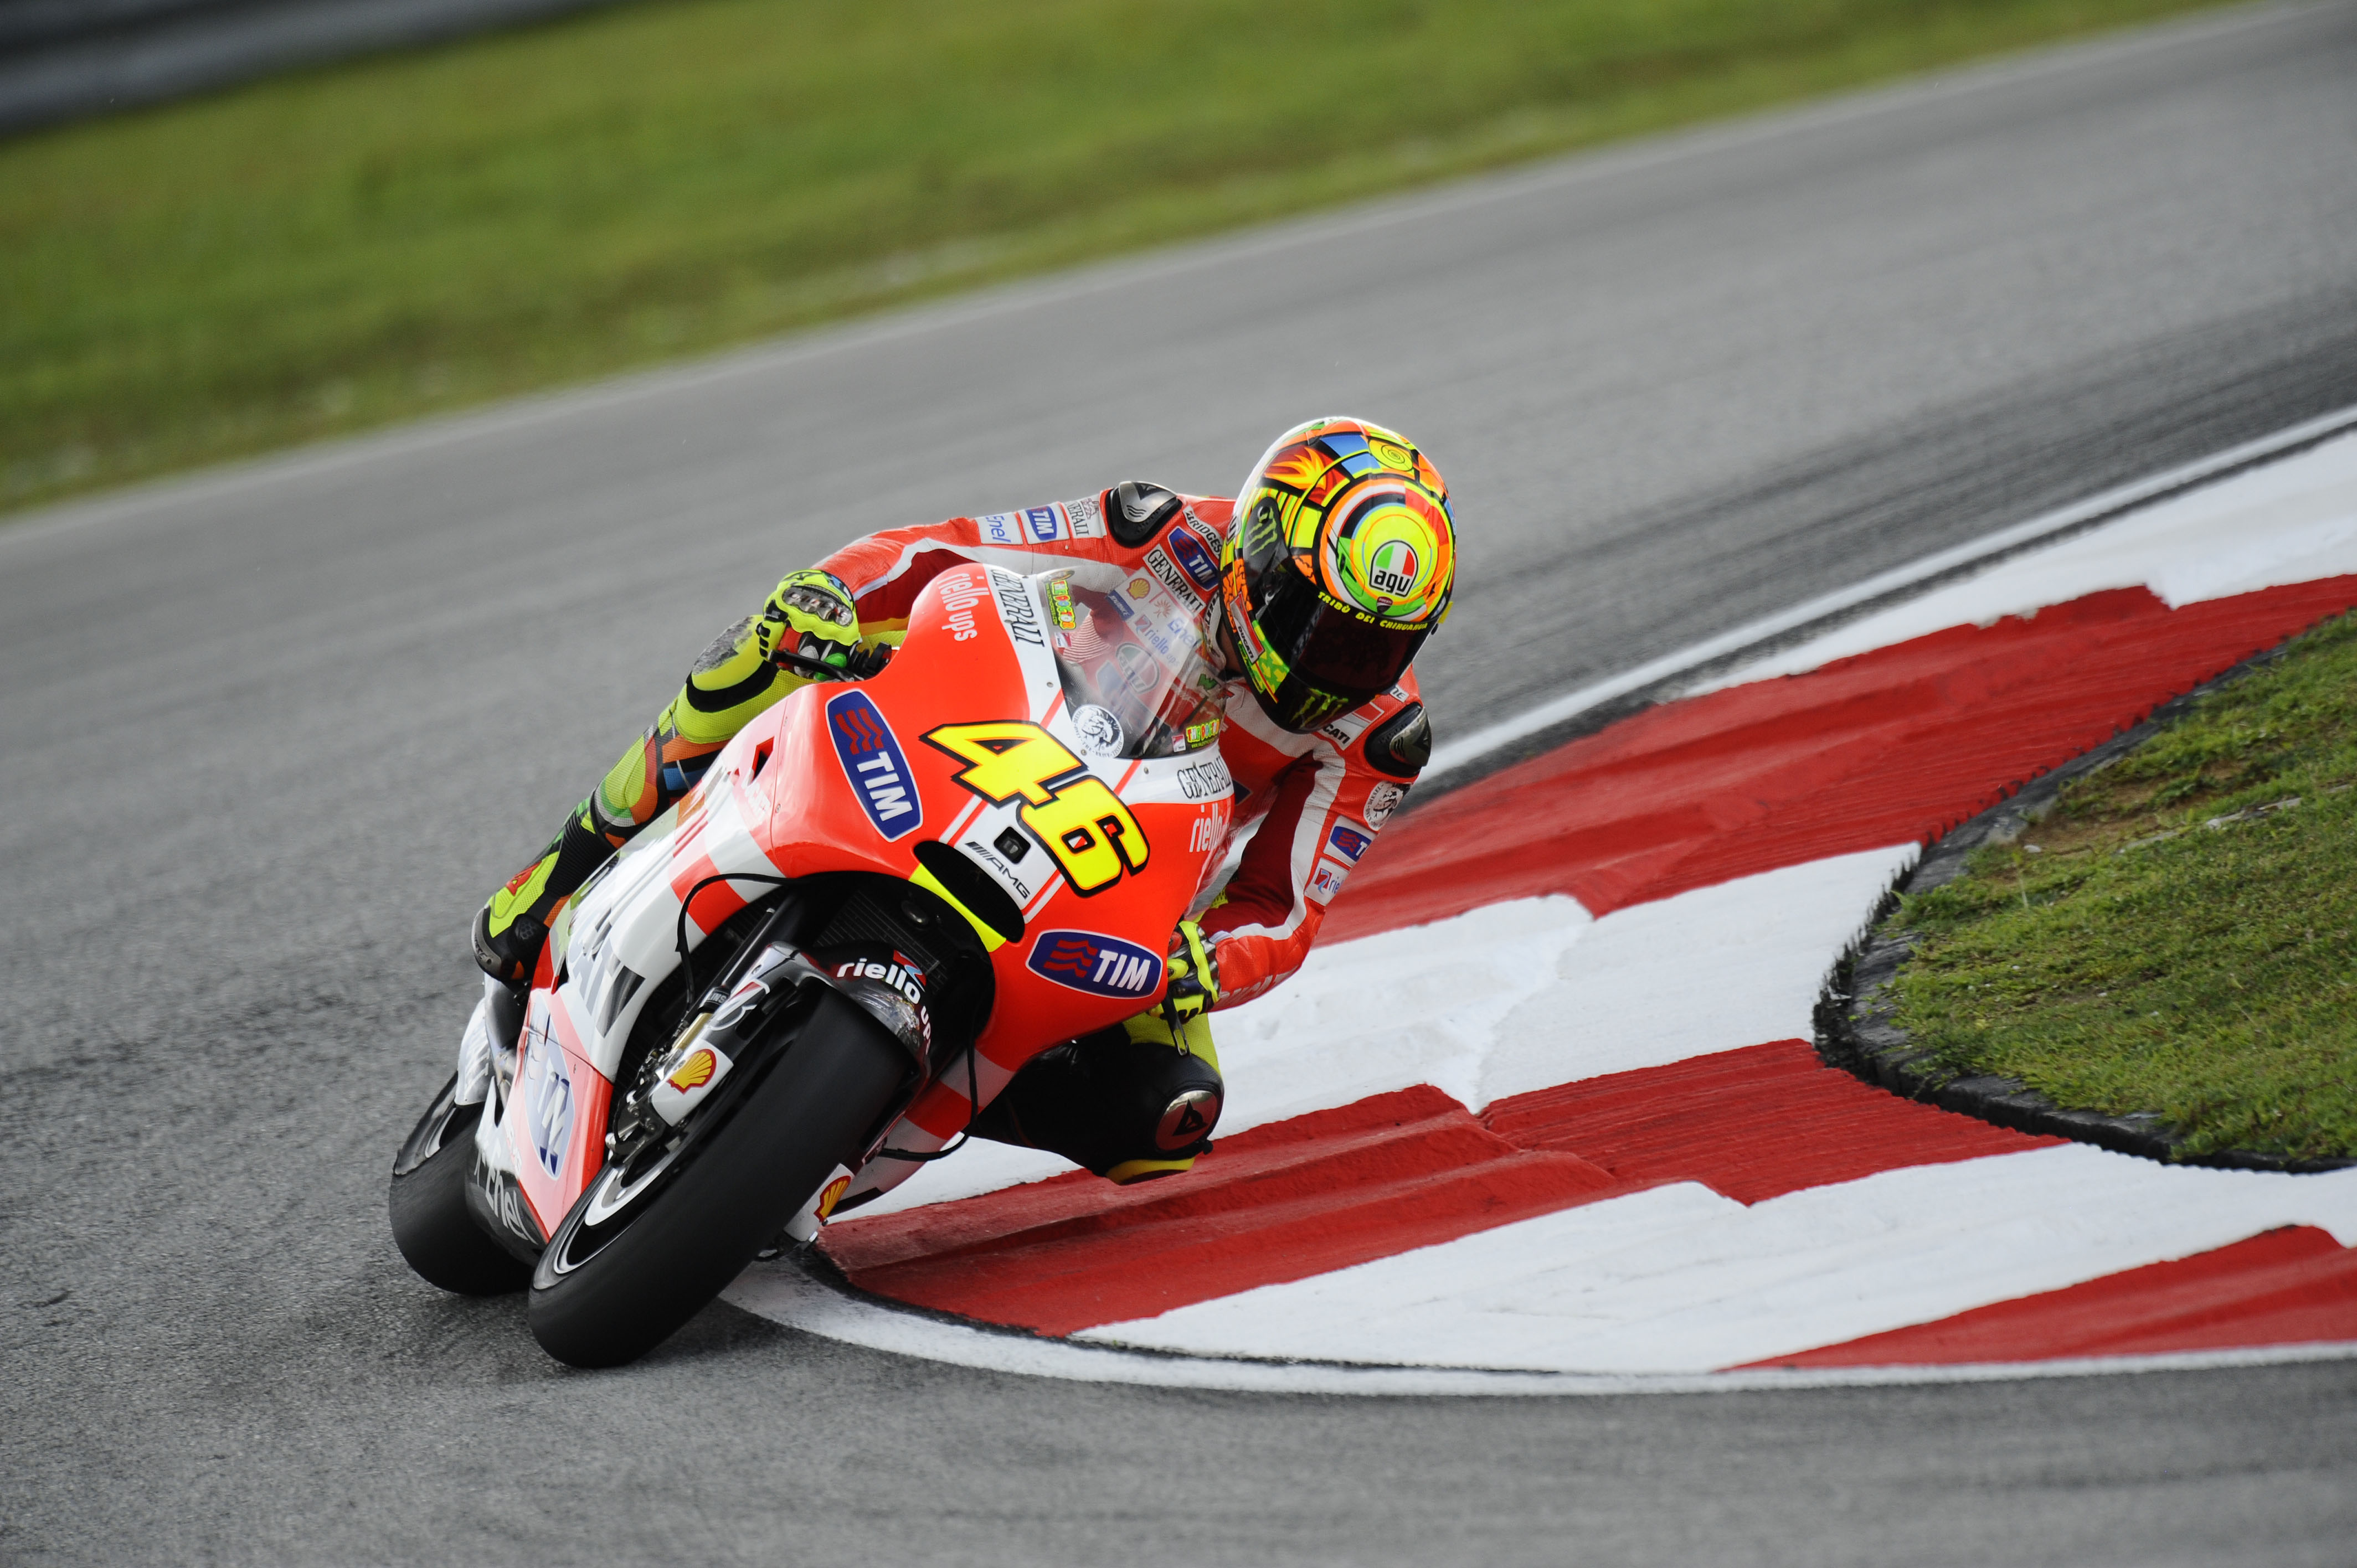 Valentino Rossi, Ducati, Sepang,